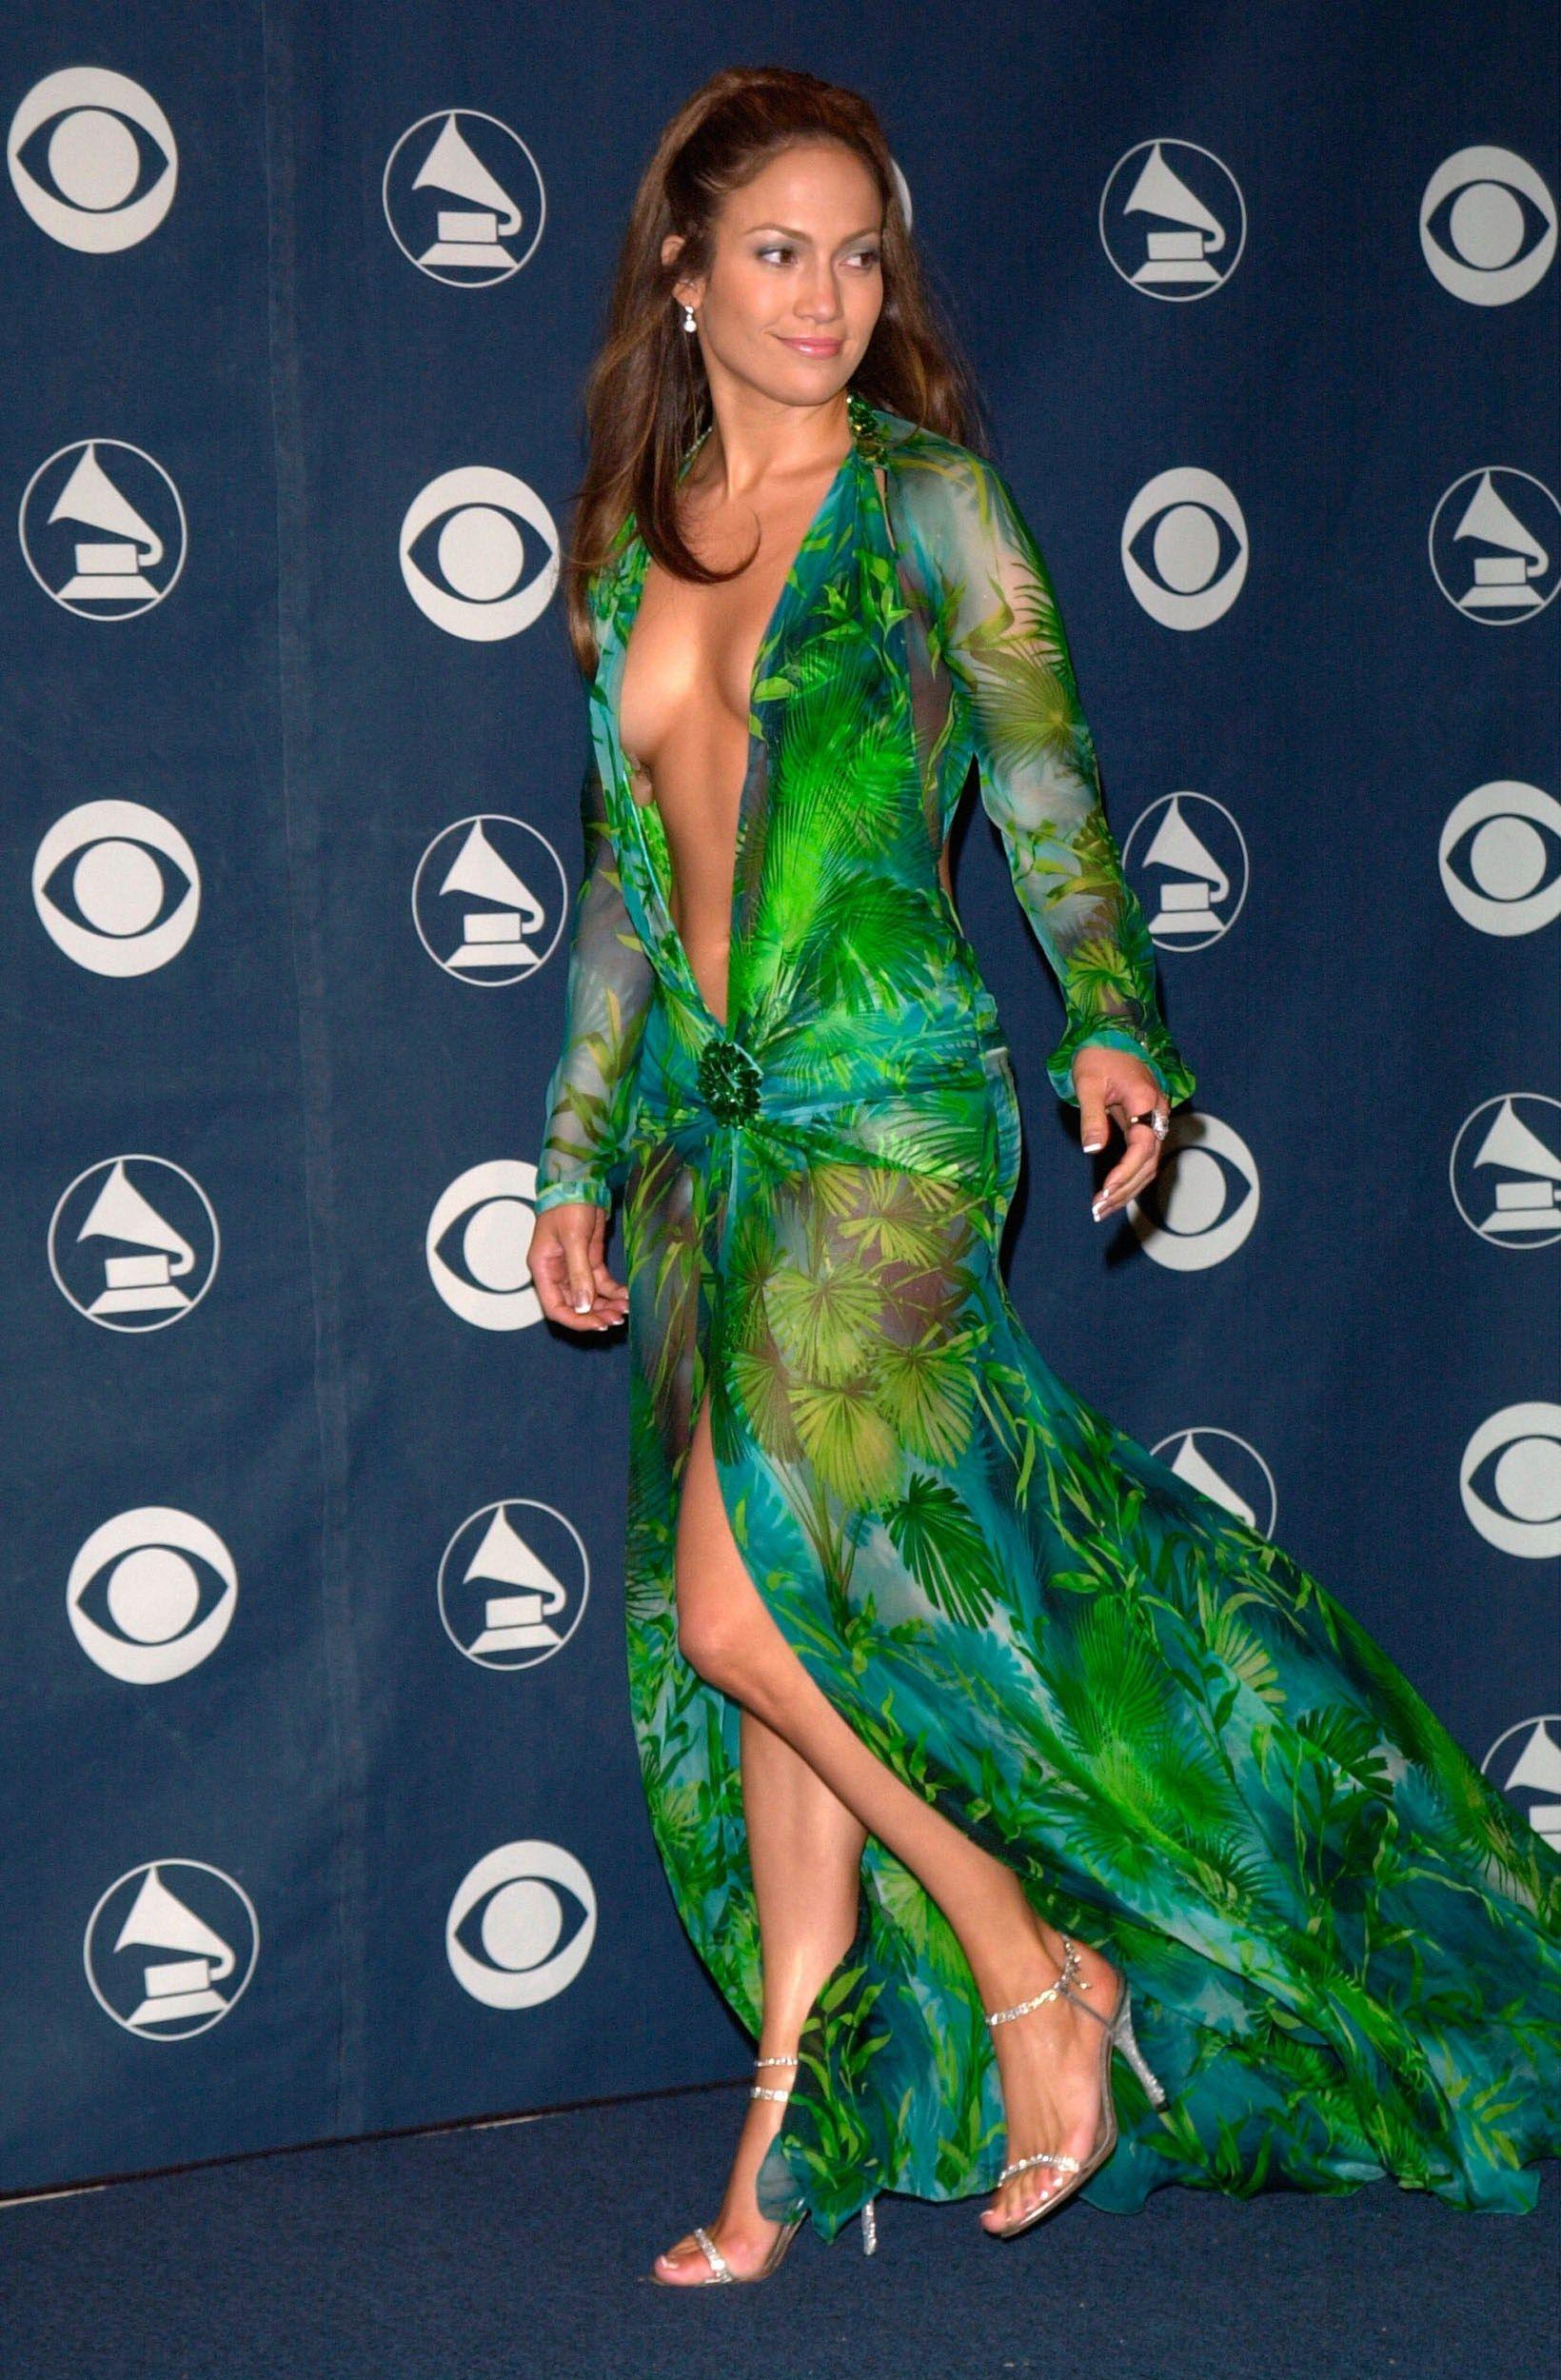 Image Result For Versace Butterfly Gown Jennifer Lopez Dress Grammy Dresses Fashion [ 2500 x 1640 Pixel ]